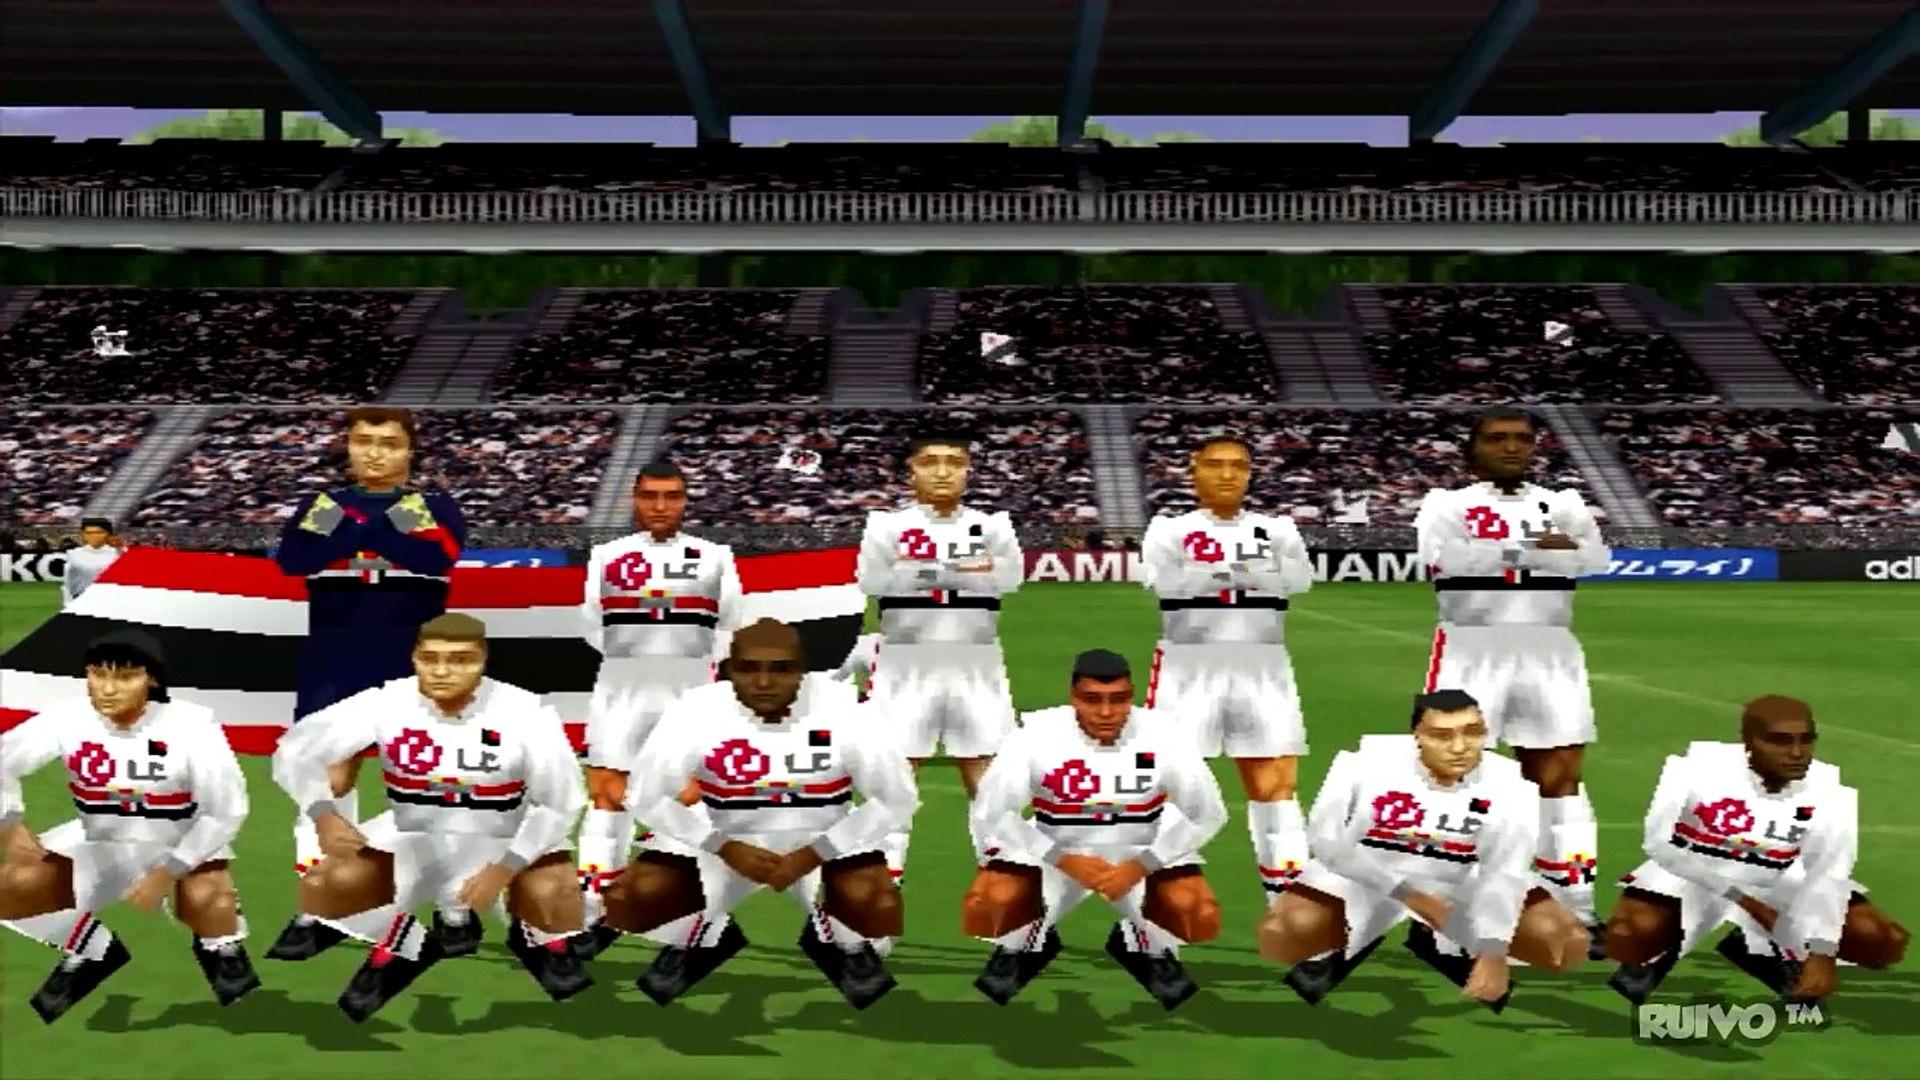 Campeonato Brasileiro 2005 (WE2002) no Playstation 1 / PS1